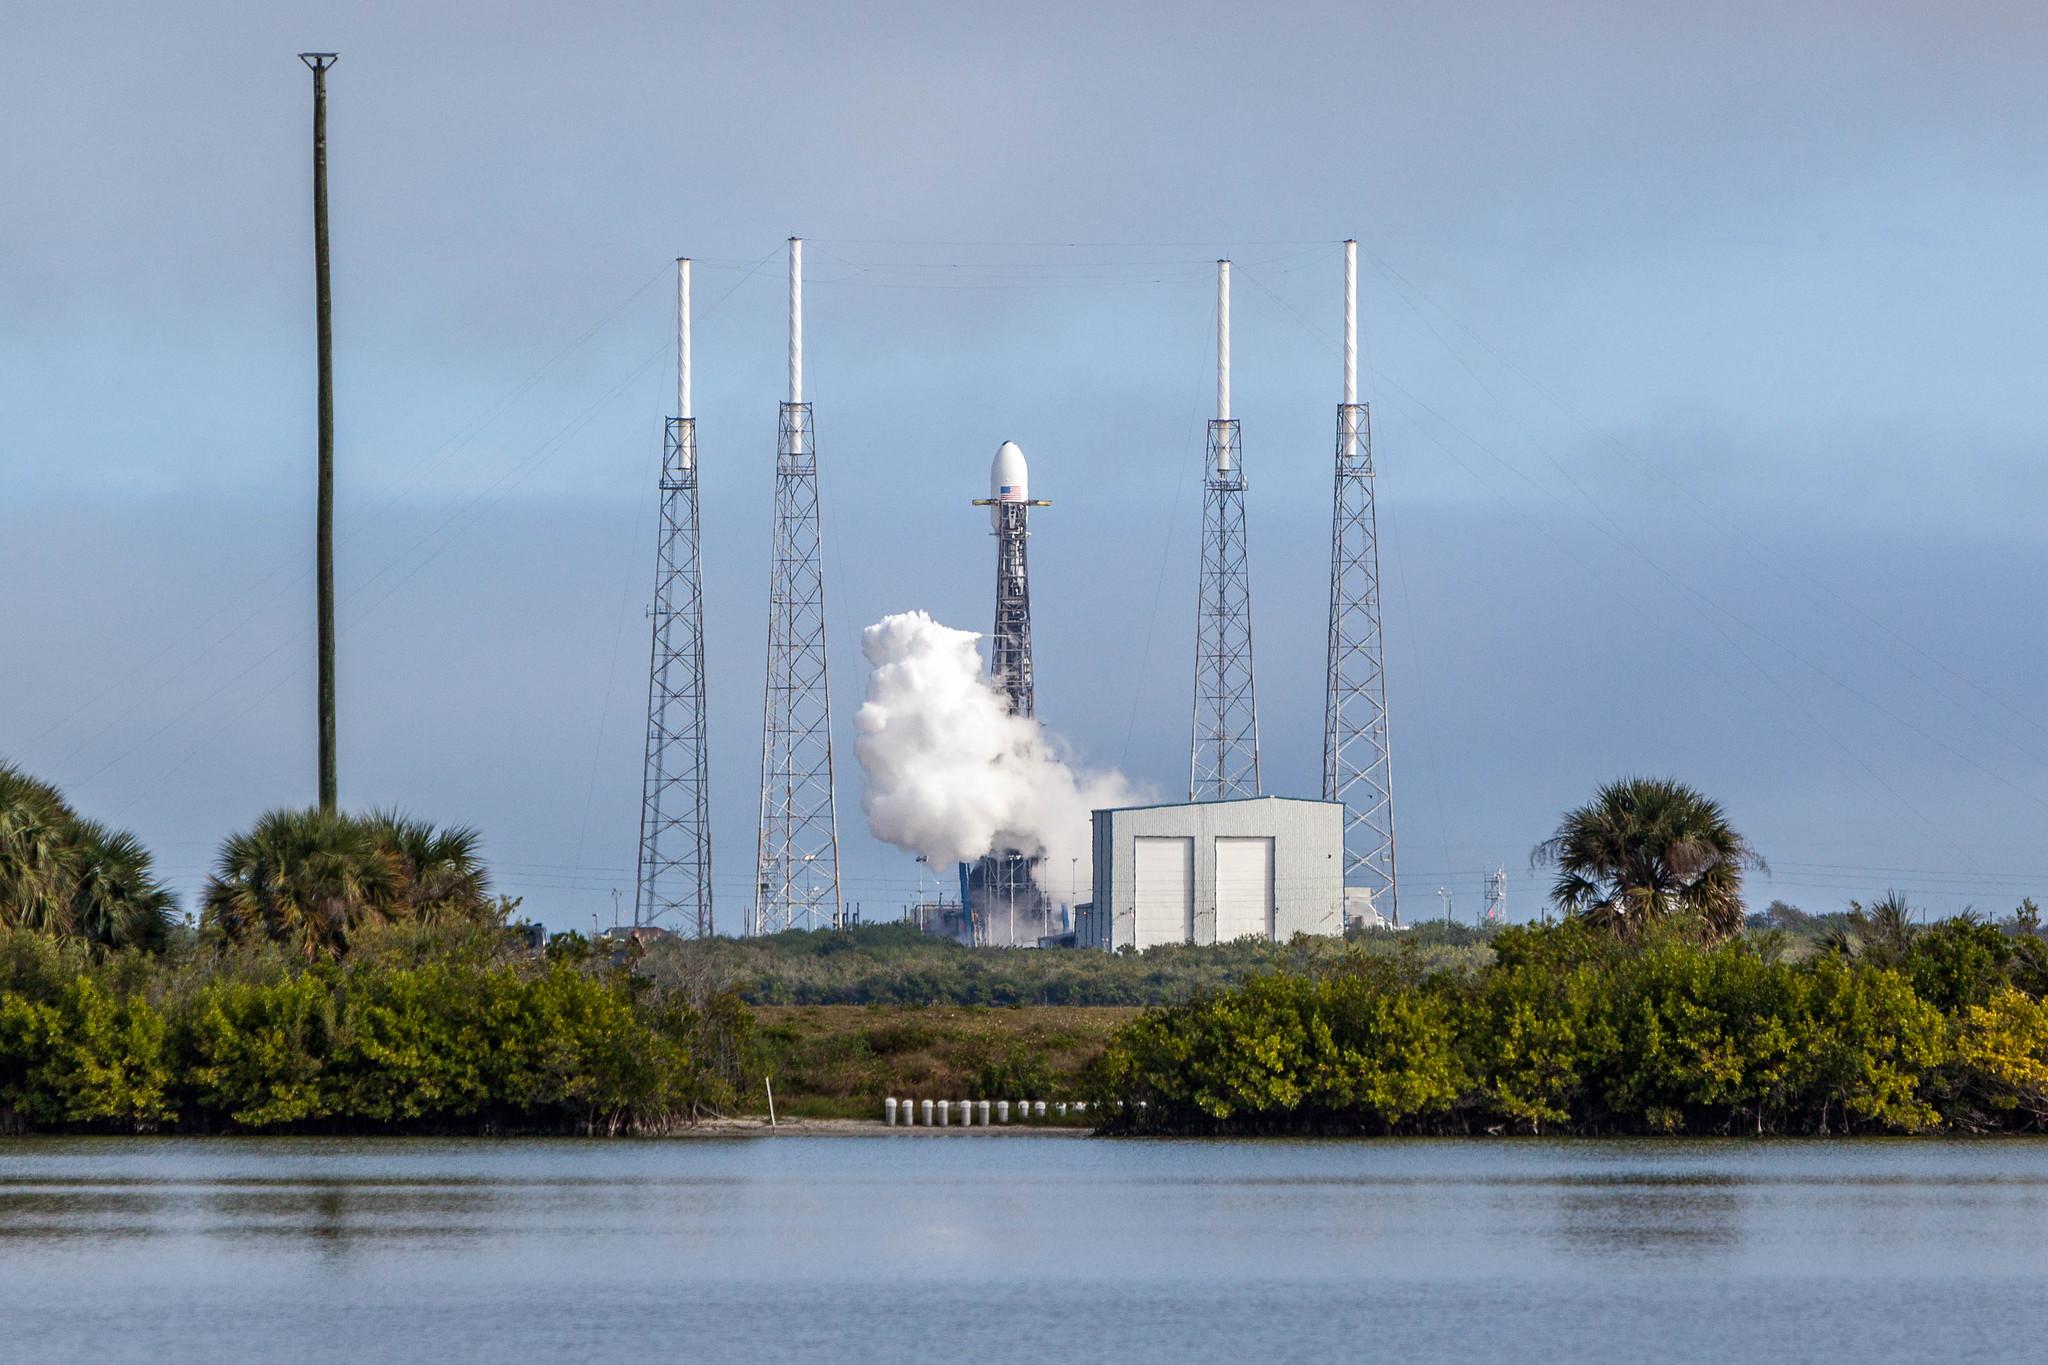 SpaceX Falcon 9 - Starlink #5